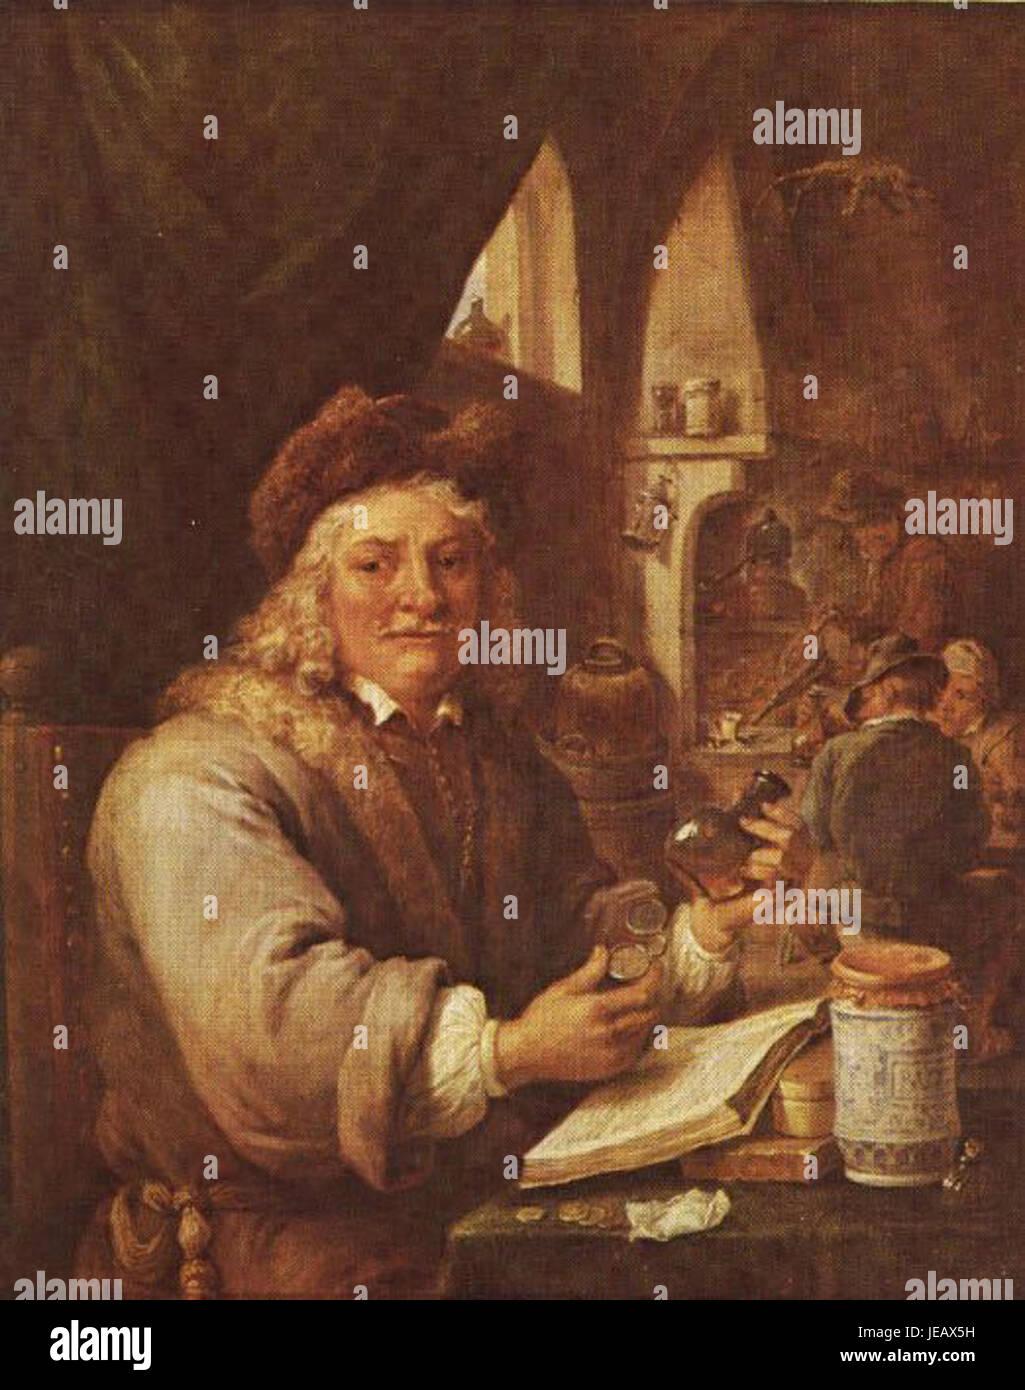 David Teniers the Younger - Self-portrait as an alchemist - Stock Image